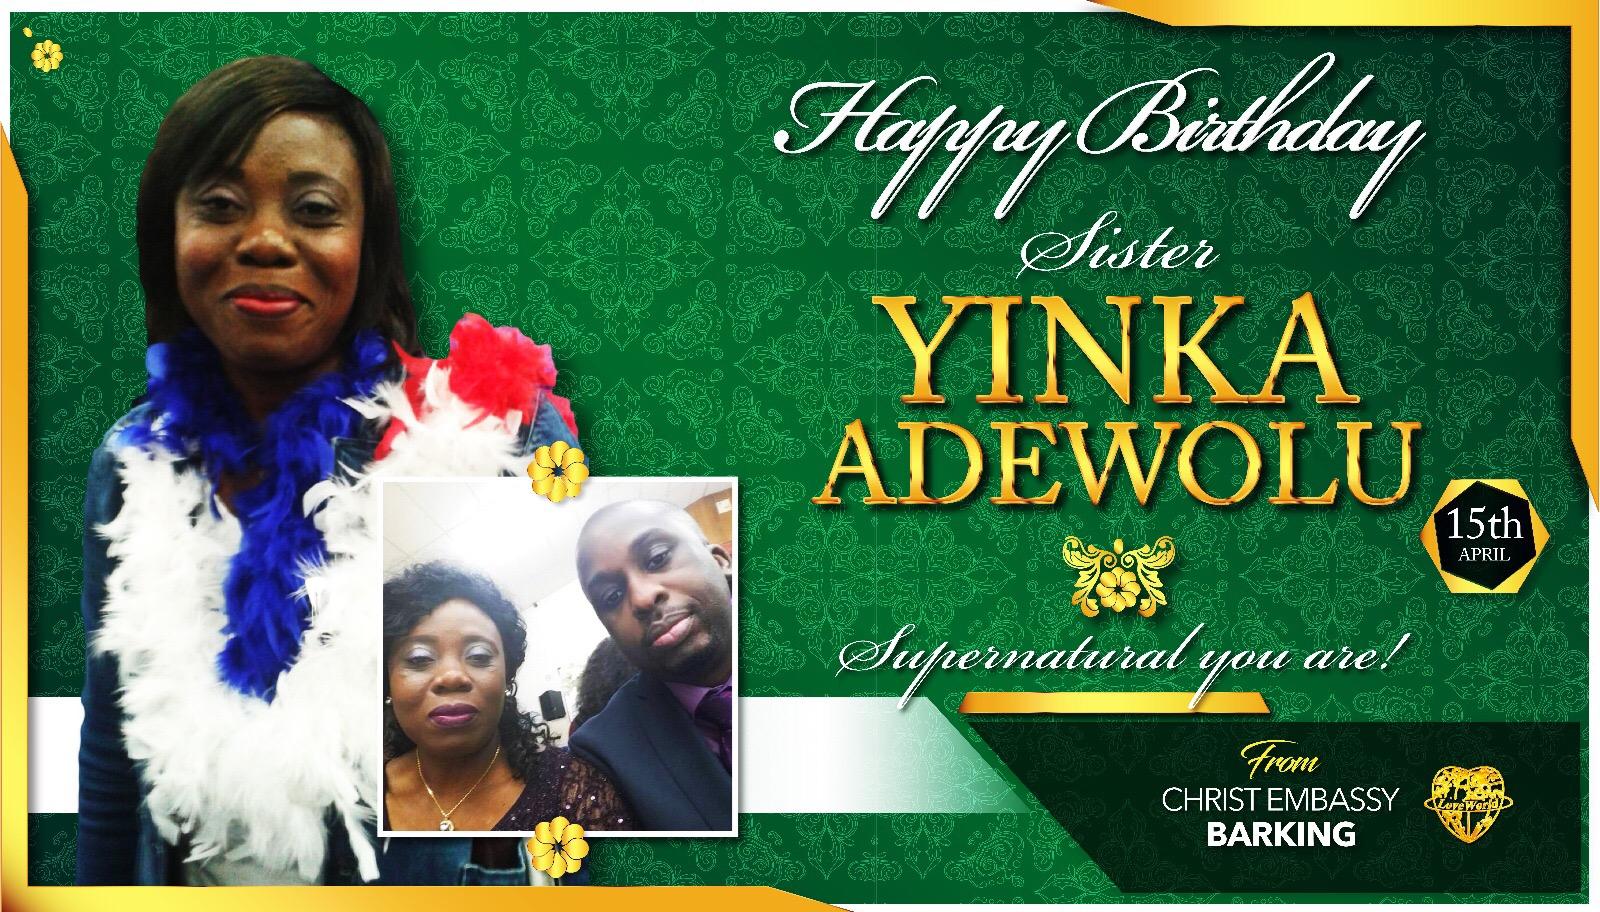 Happy birthday sweet sis Yinka